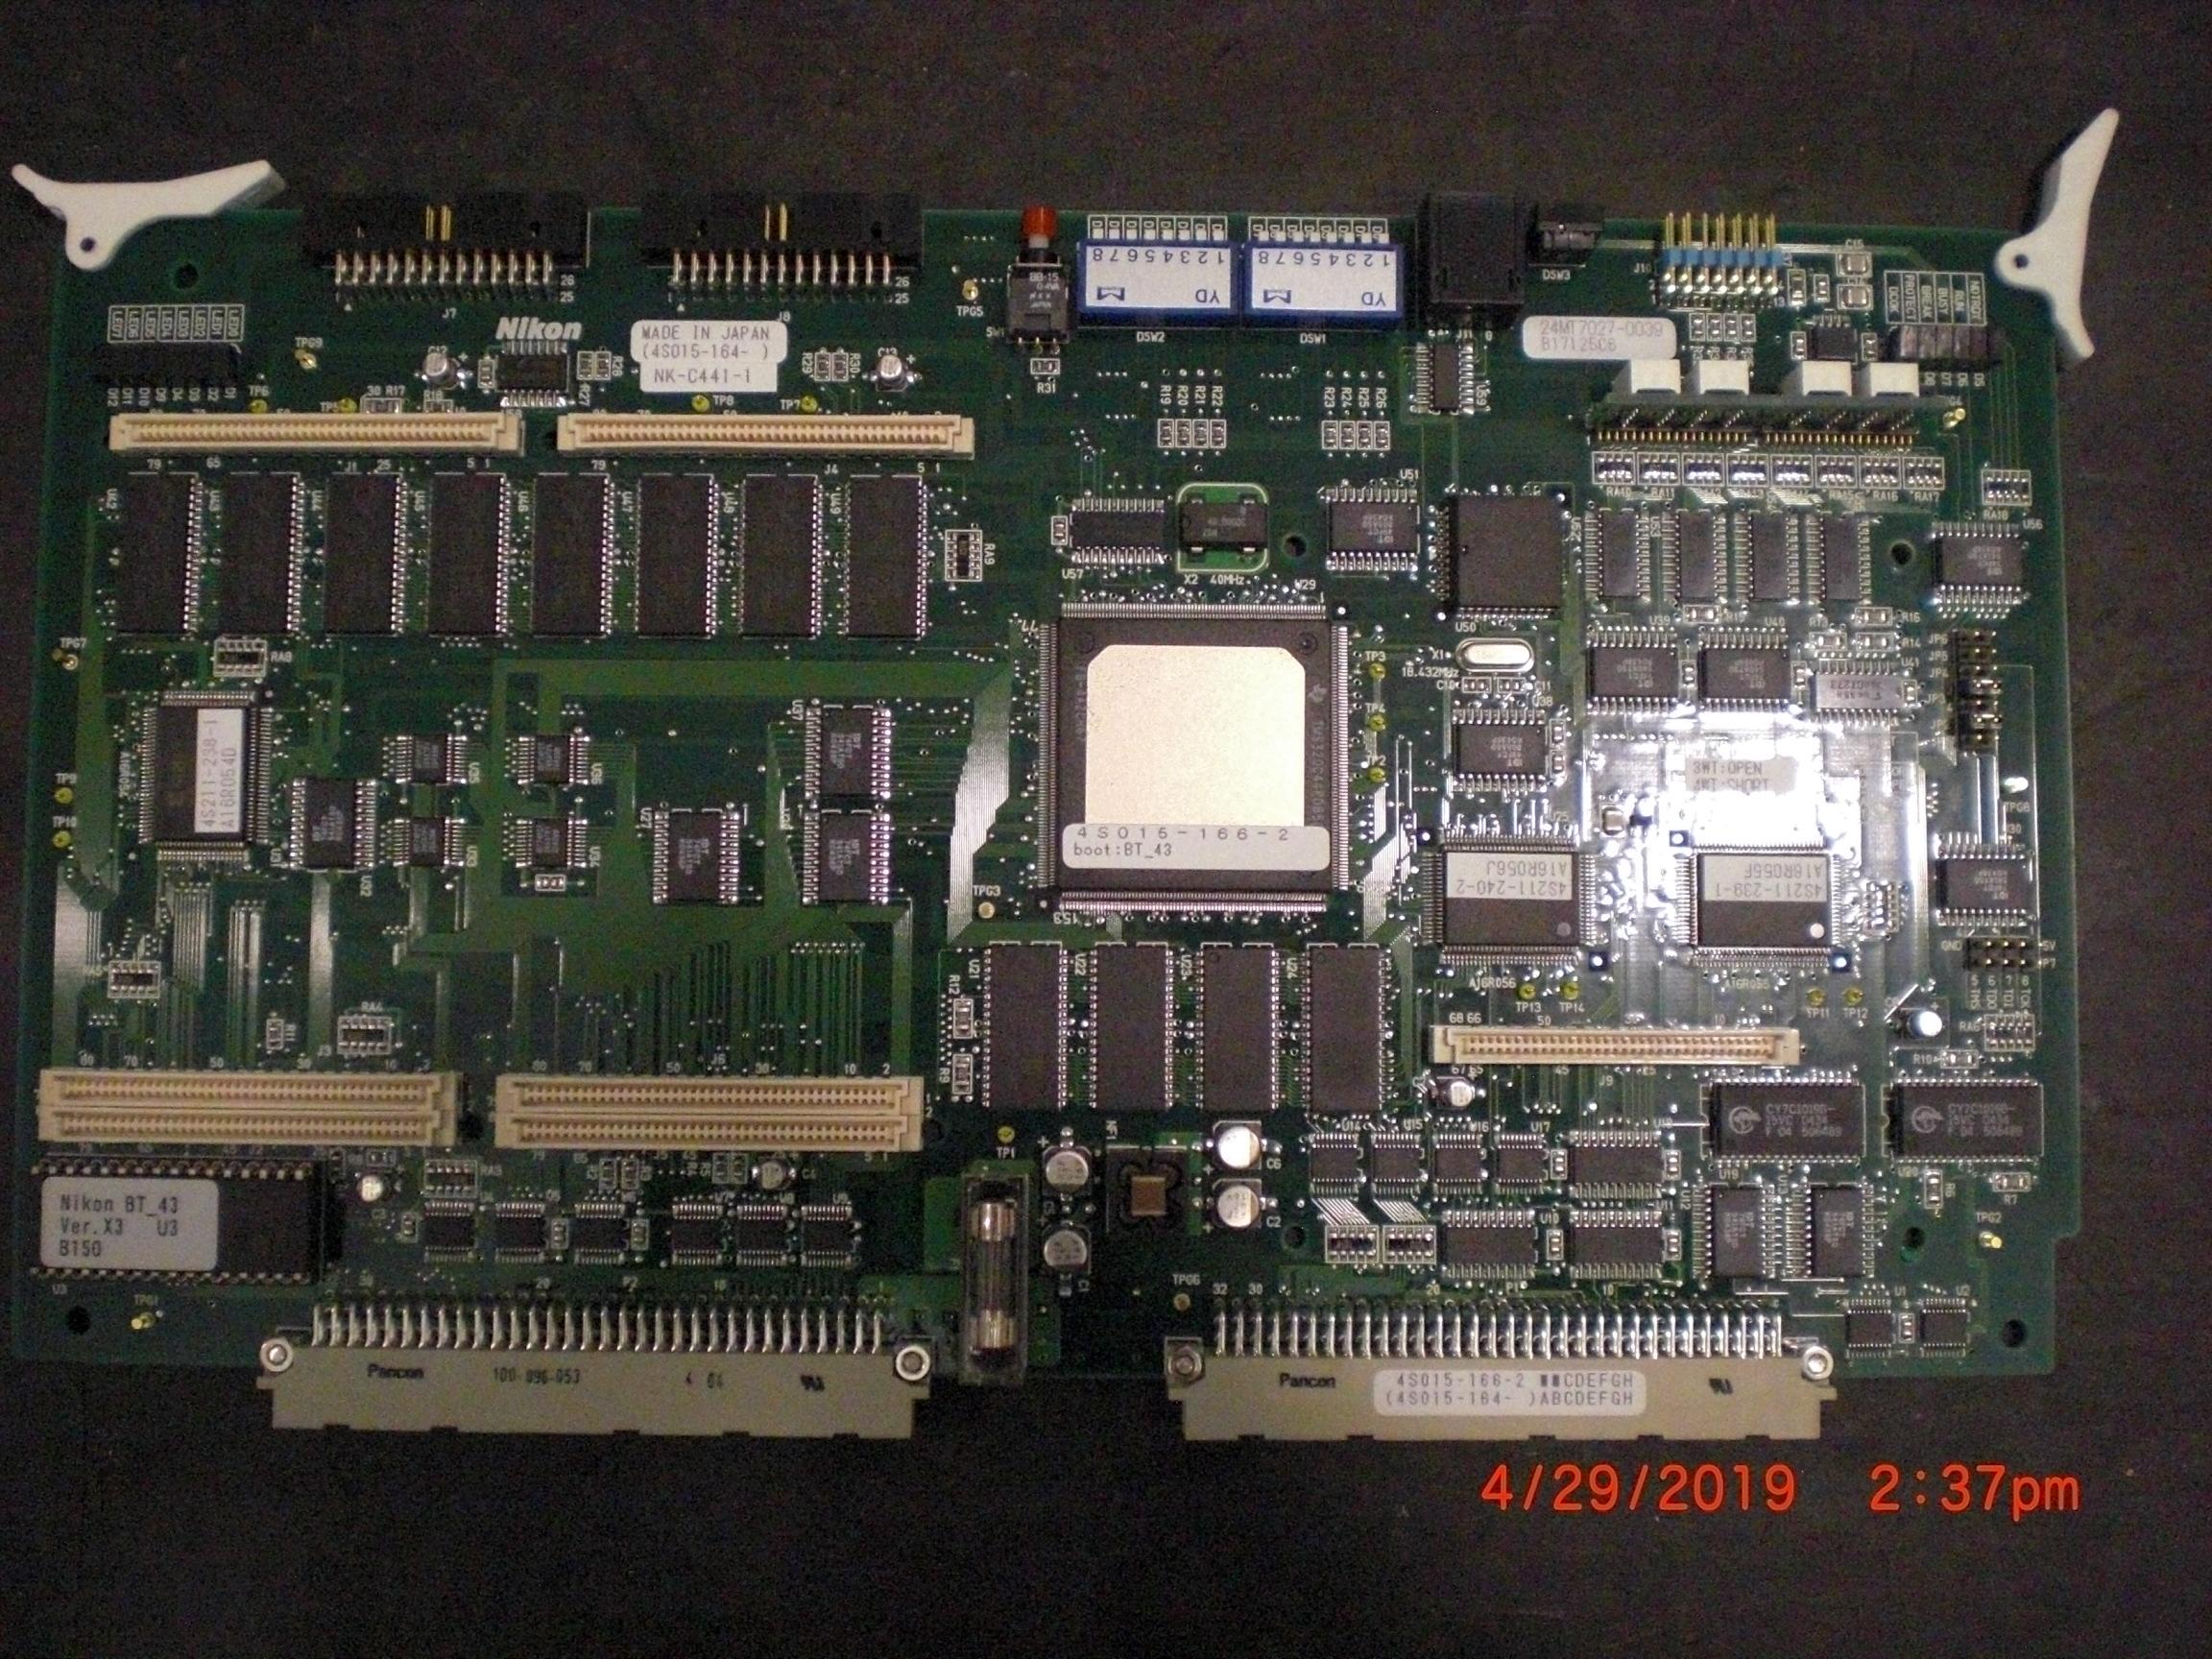 PCB NIKON 4S015-164 NK-C441-1 Communications Control